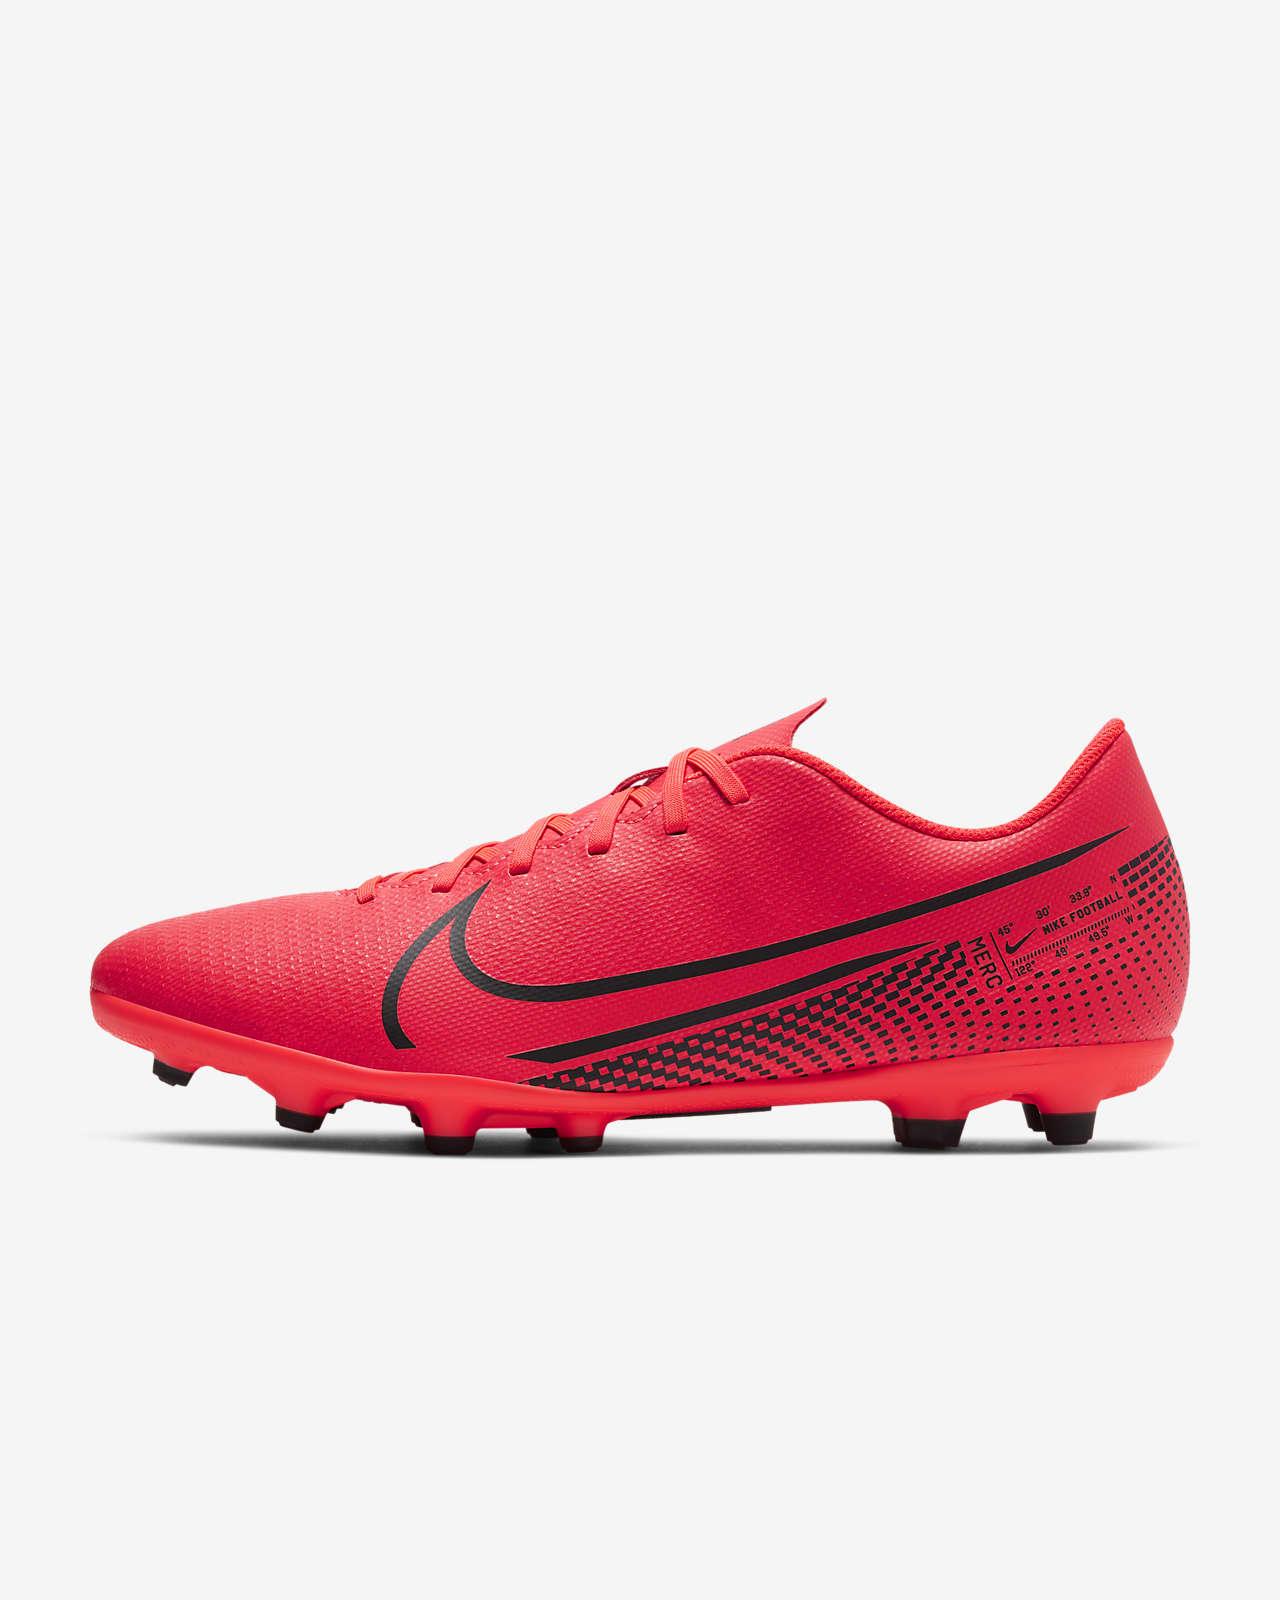 Nike Mercurial Vapor 13 Club MG Multi-Ground Football Boot